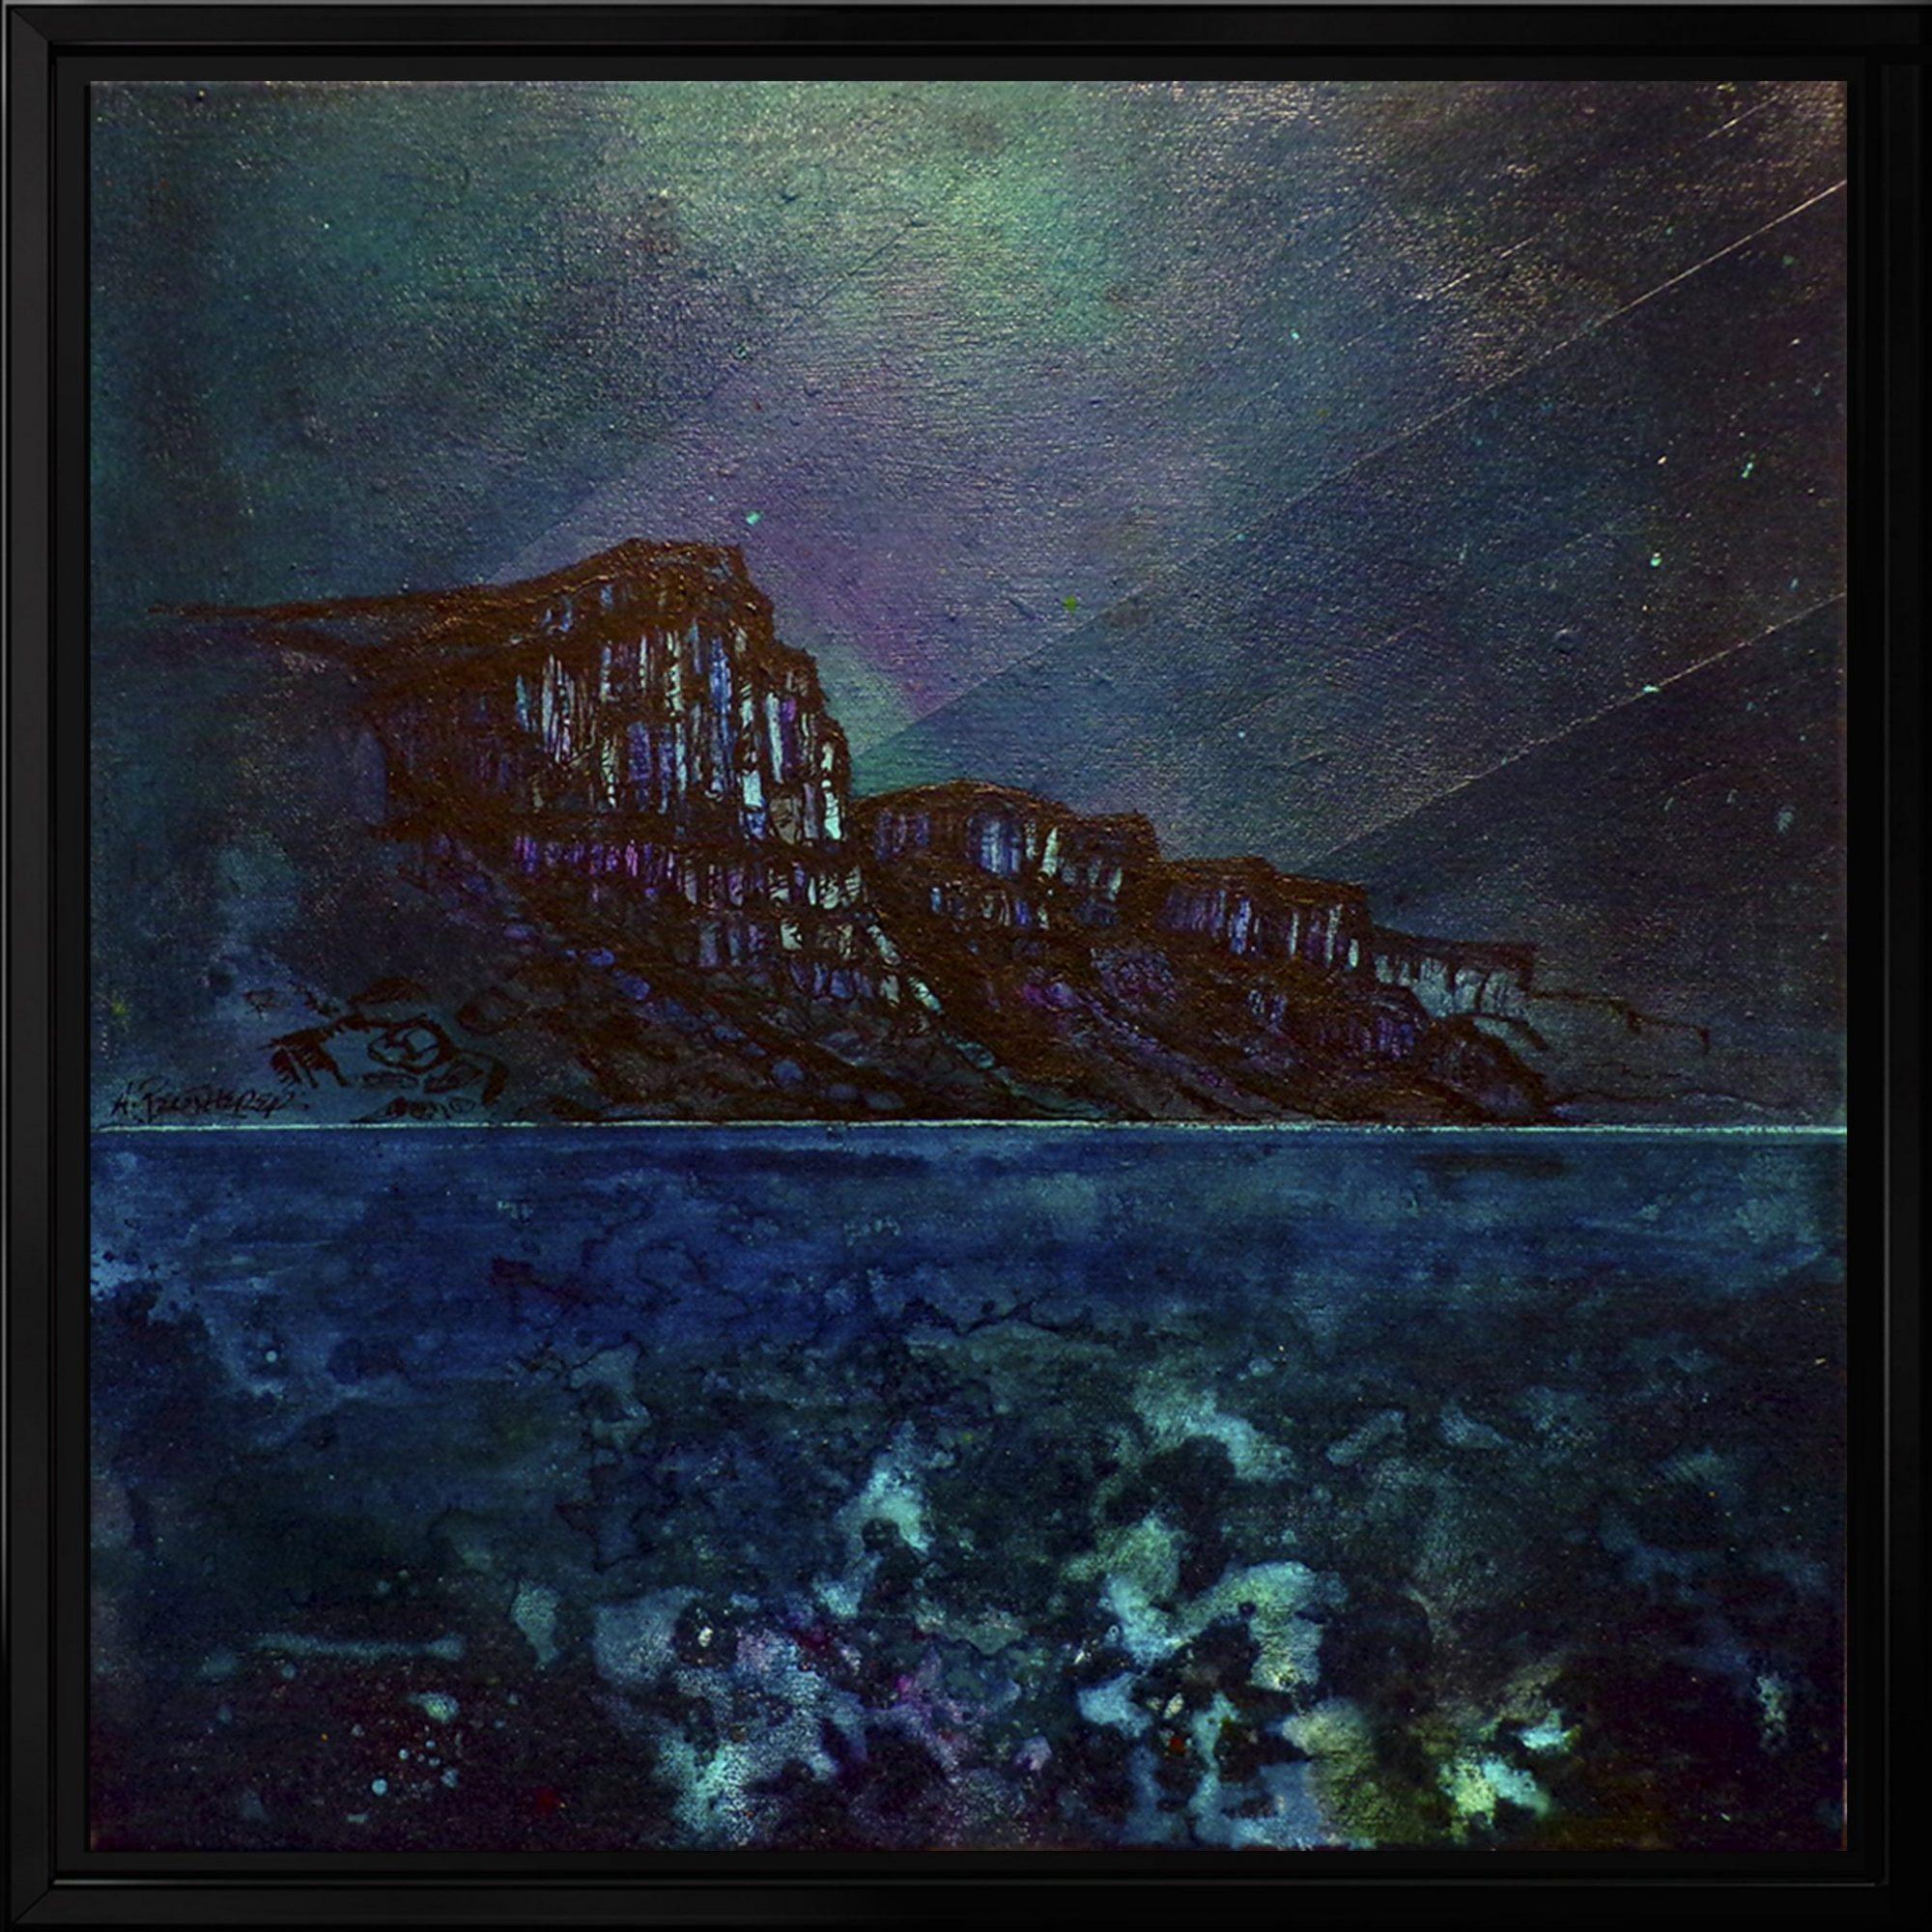 Kilt Rock, Skye - Framed canvas painting and prints